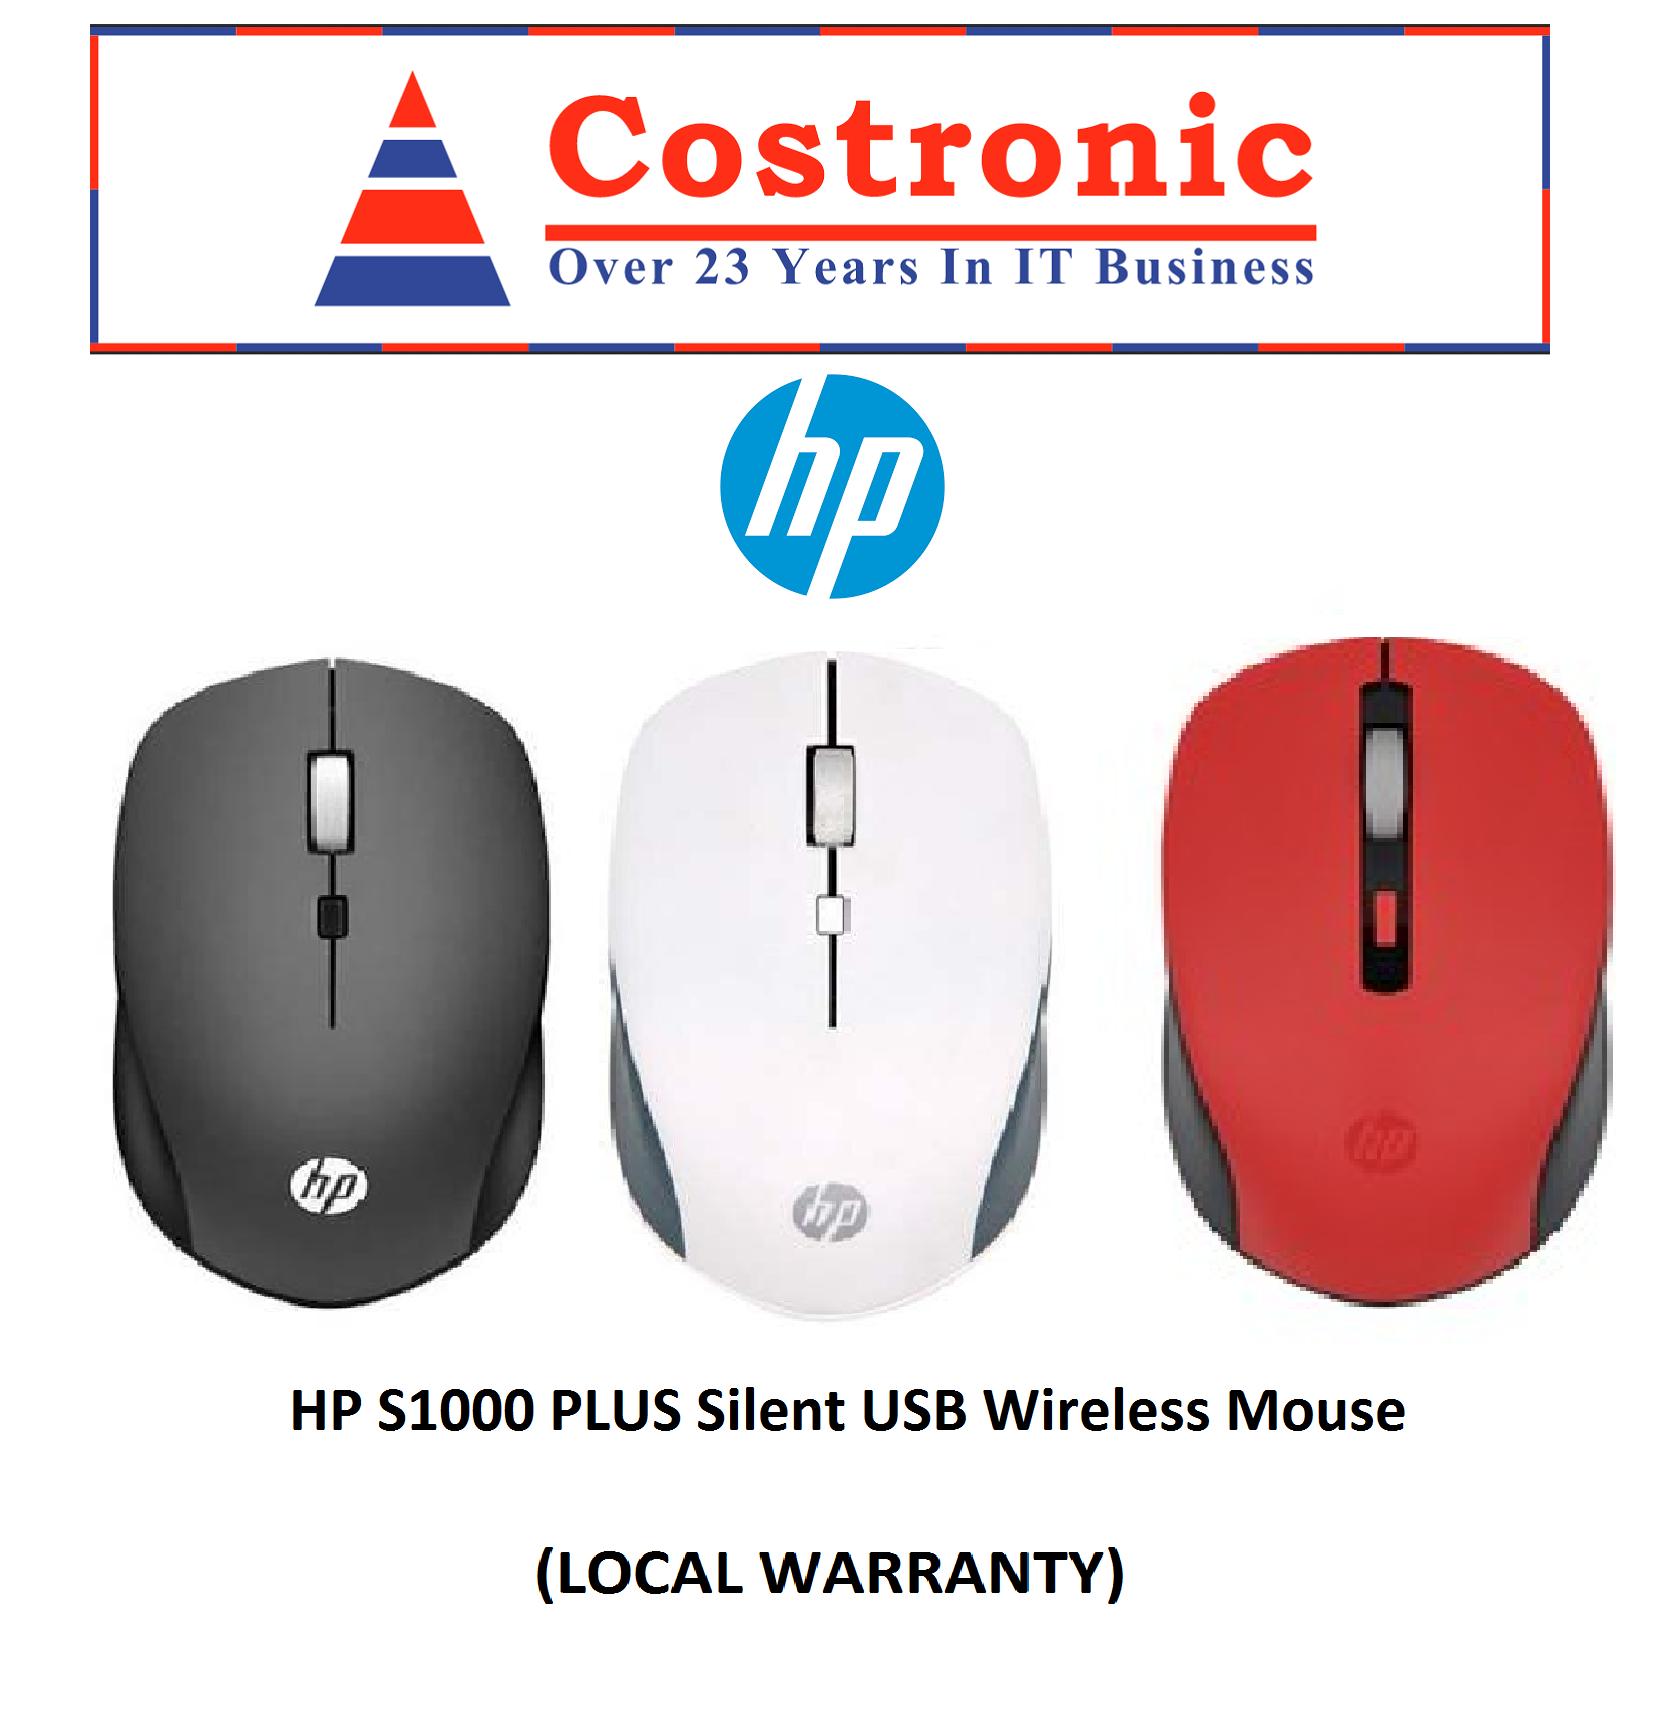 Hp S1000 Plus Silent Usb Wireless Mouse 1600 Dpi Adjustable Usb 3 0 Receiver Optical Computer Mouse 2 4ghz Ergonomic Mice For Laptop Pc Mouse Black Red White Colour Lazada Singapore